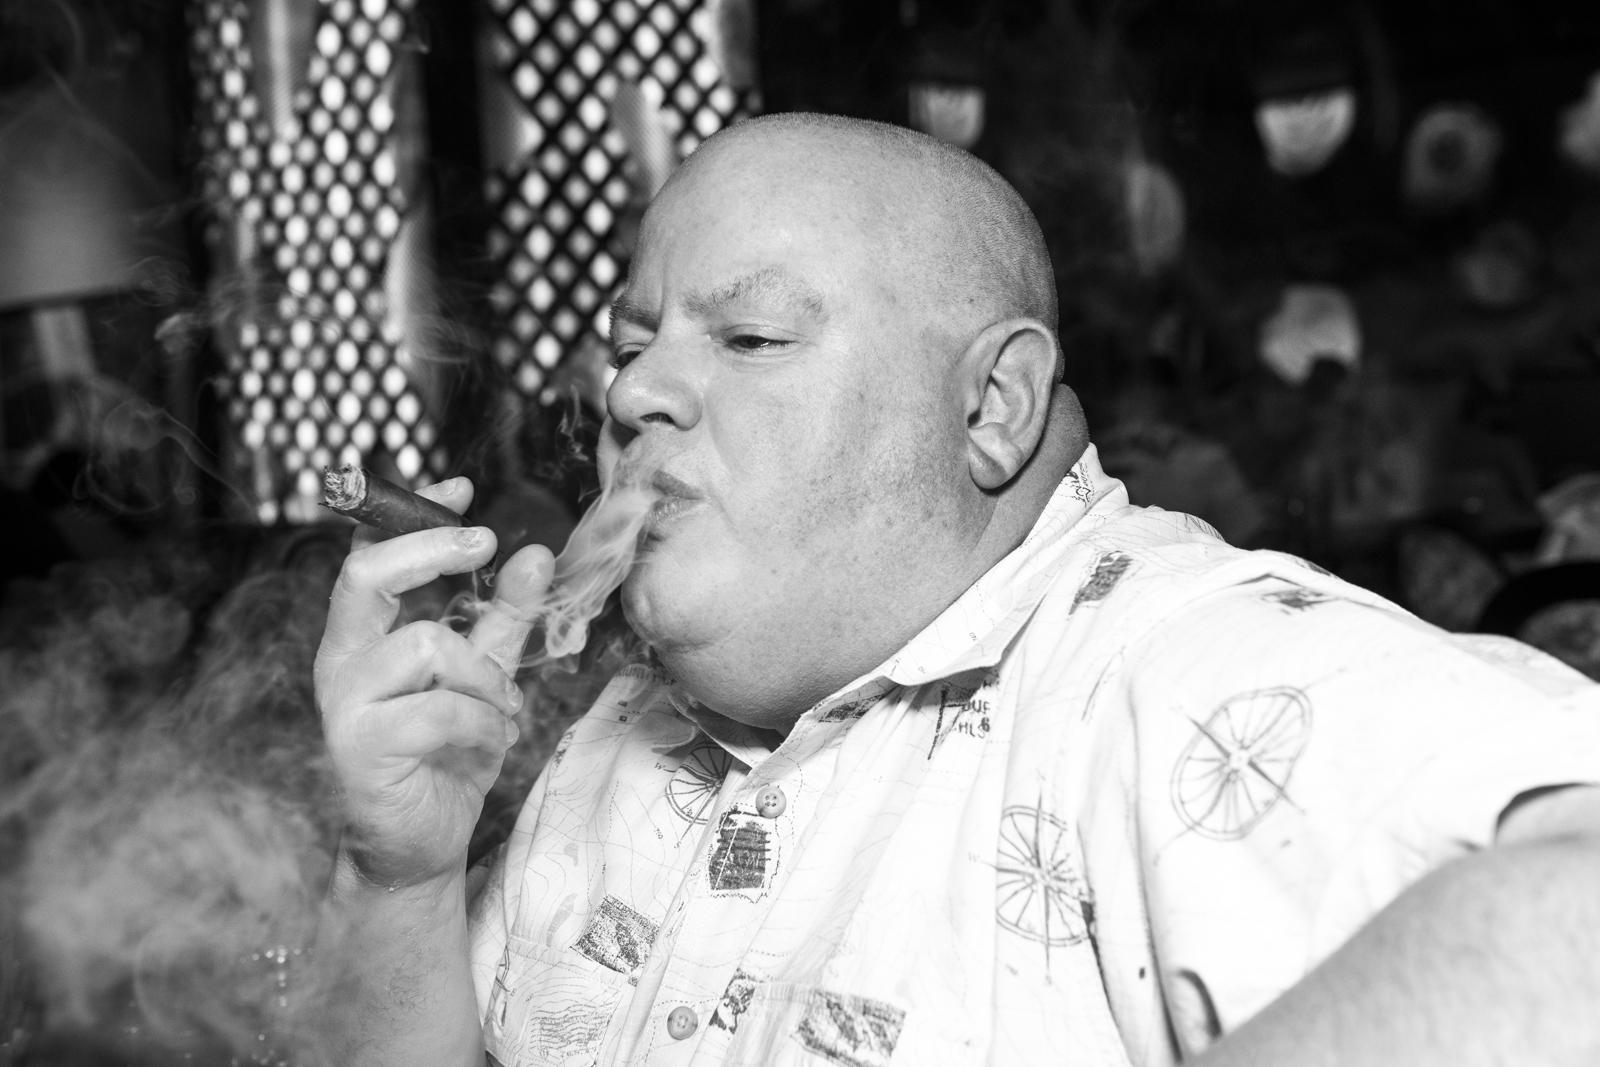 Burn-atlanta-cigar-7826.jpg